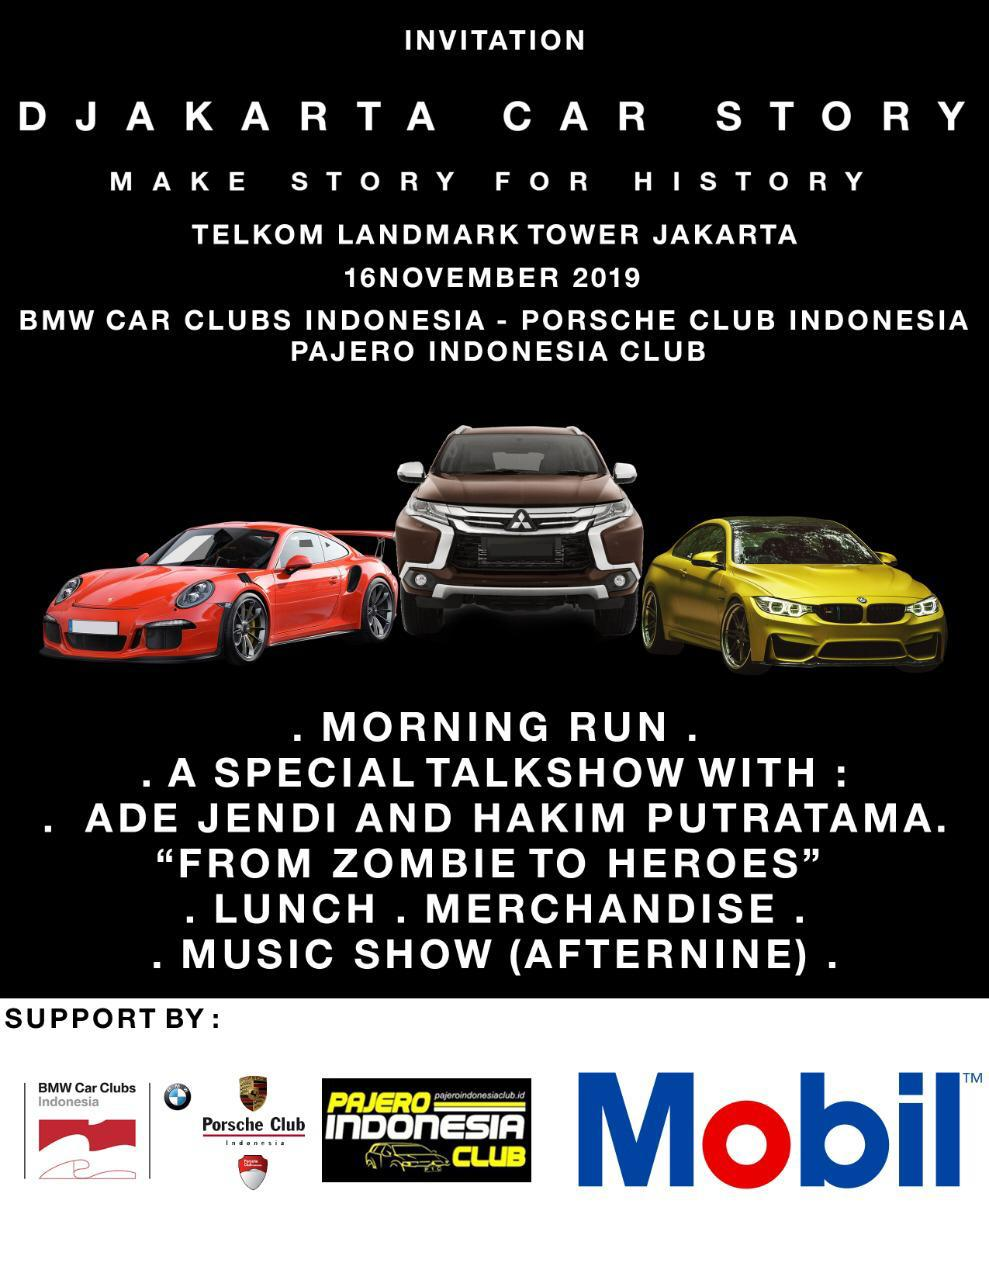 DJAKARTA CAR STORY